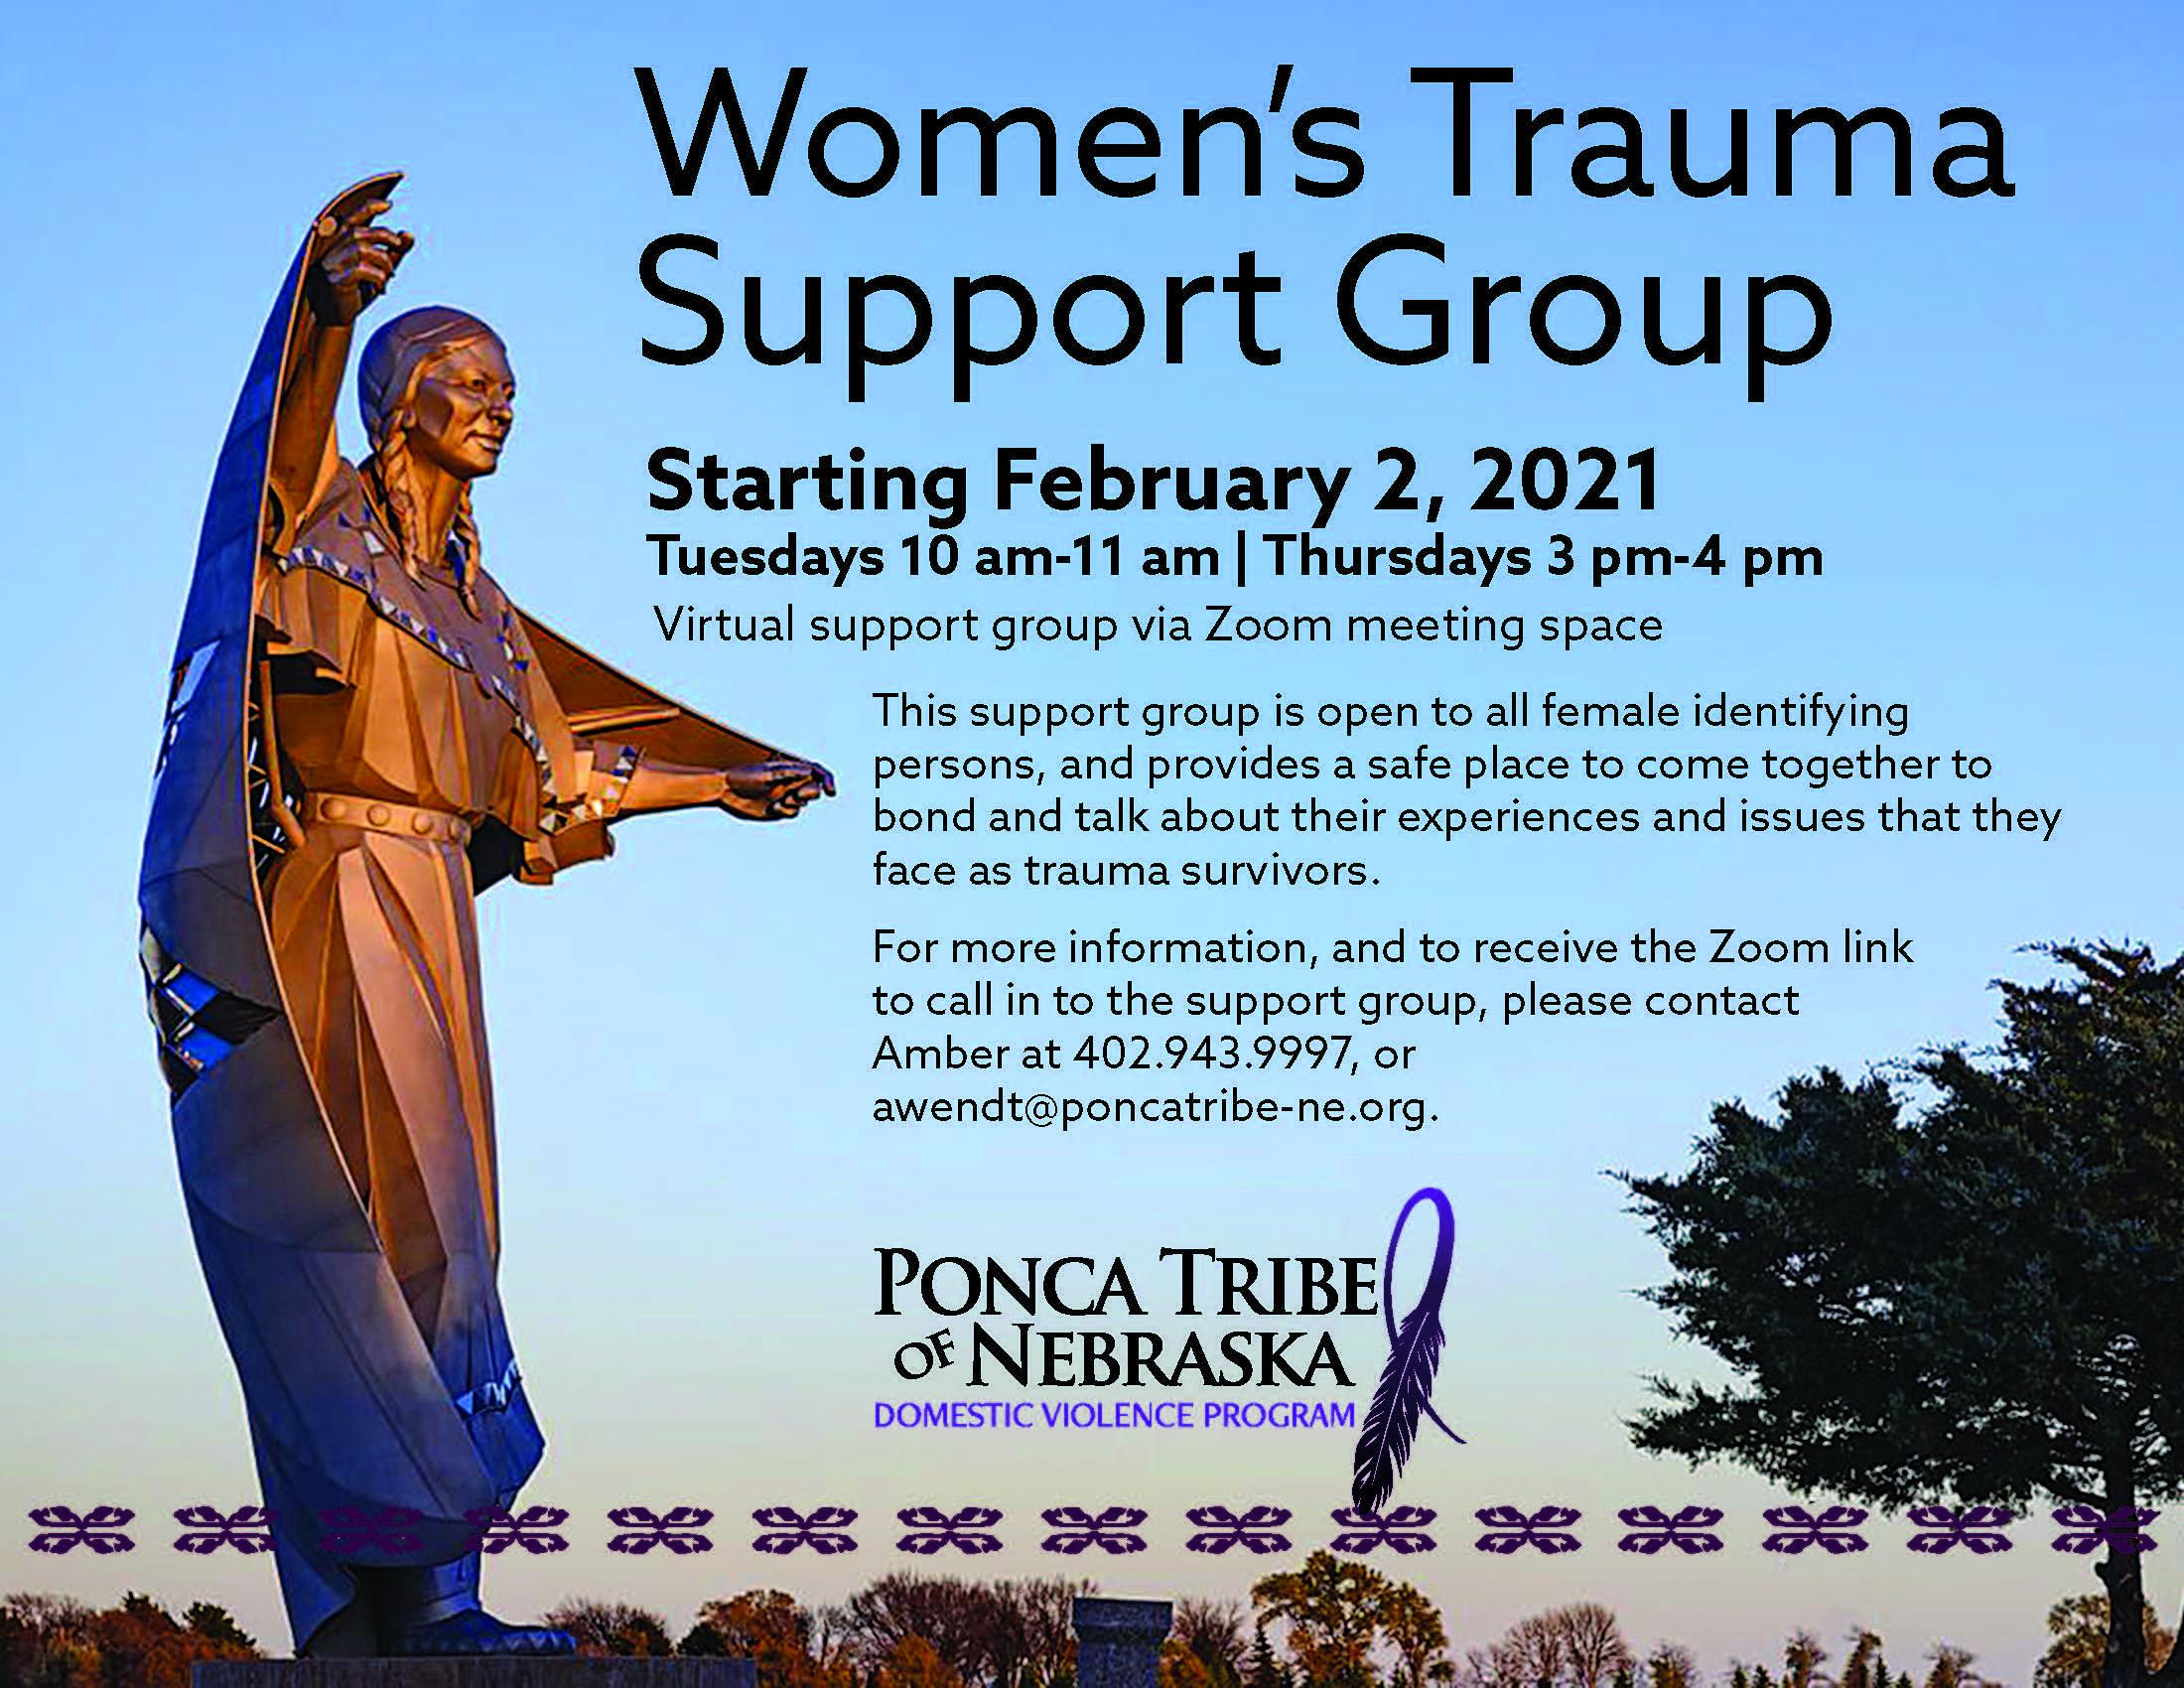 Women's Trauma Support Group